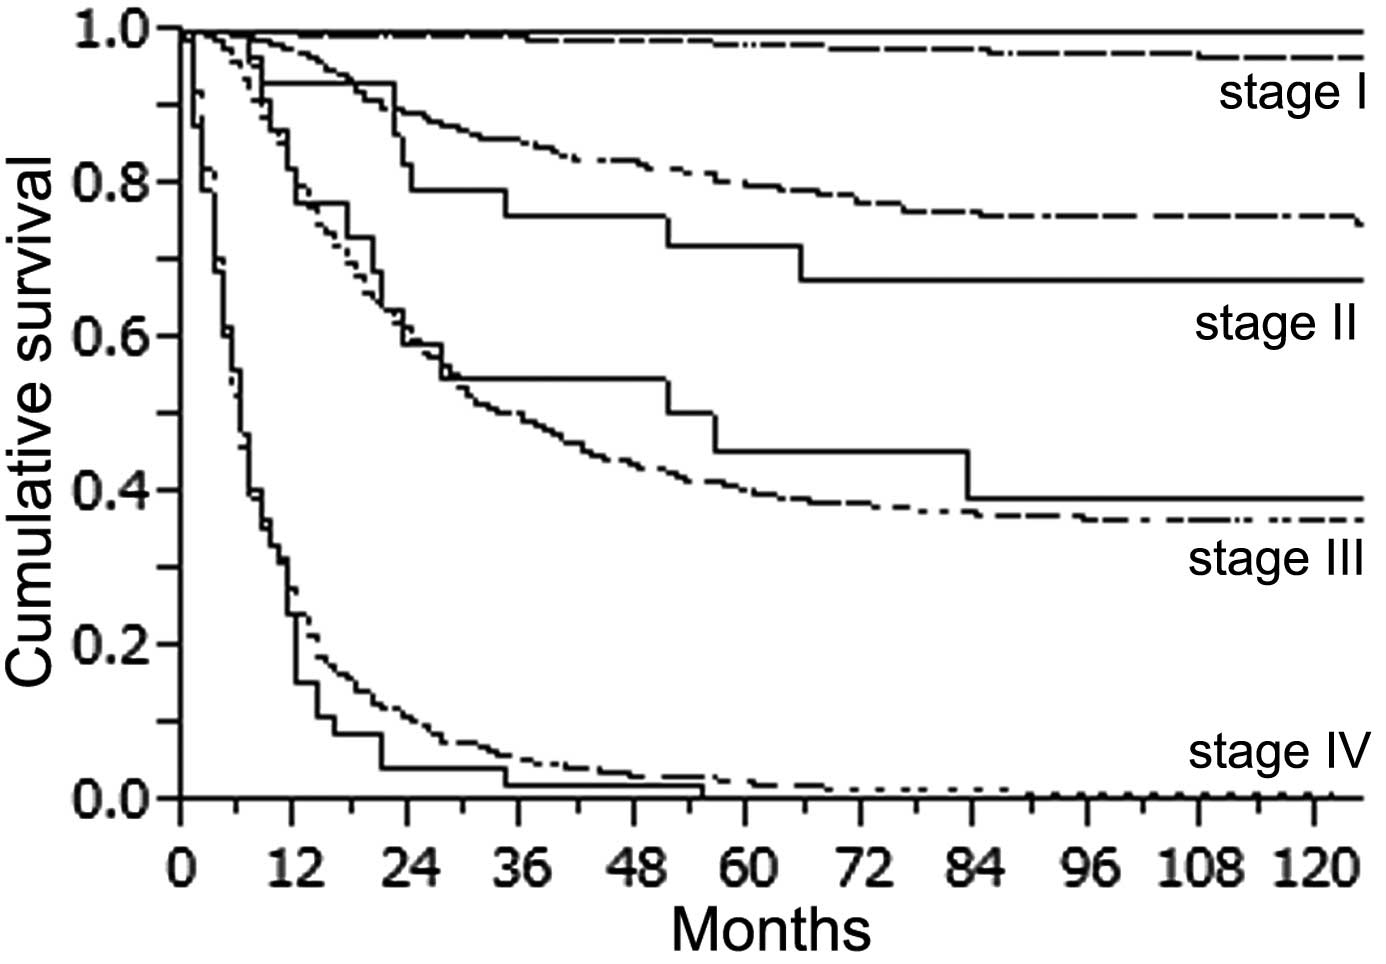 skin papillomas pictures cancer de prostata ultima etapa